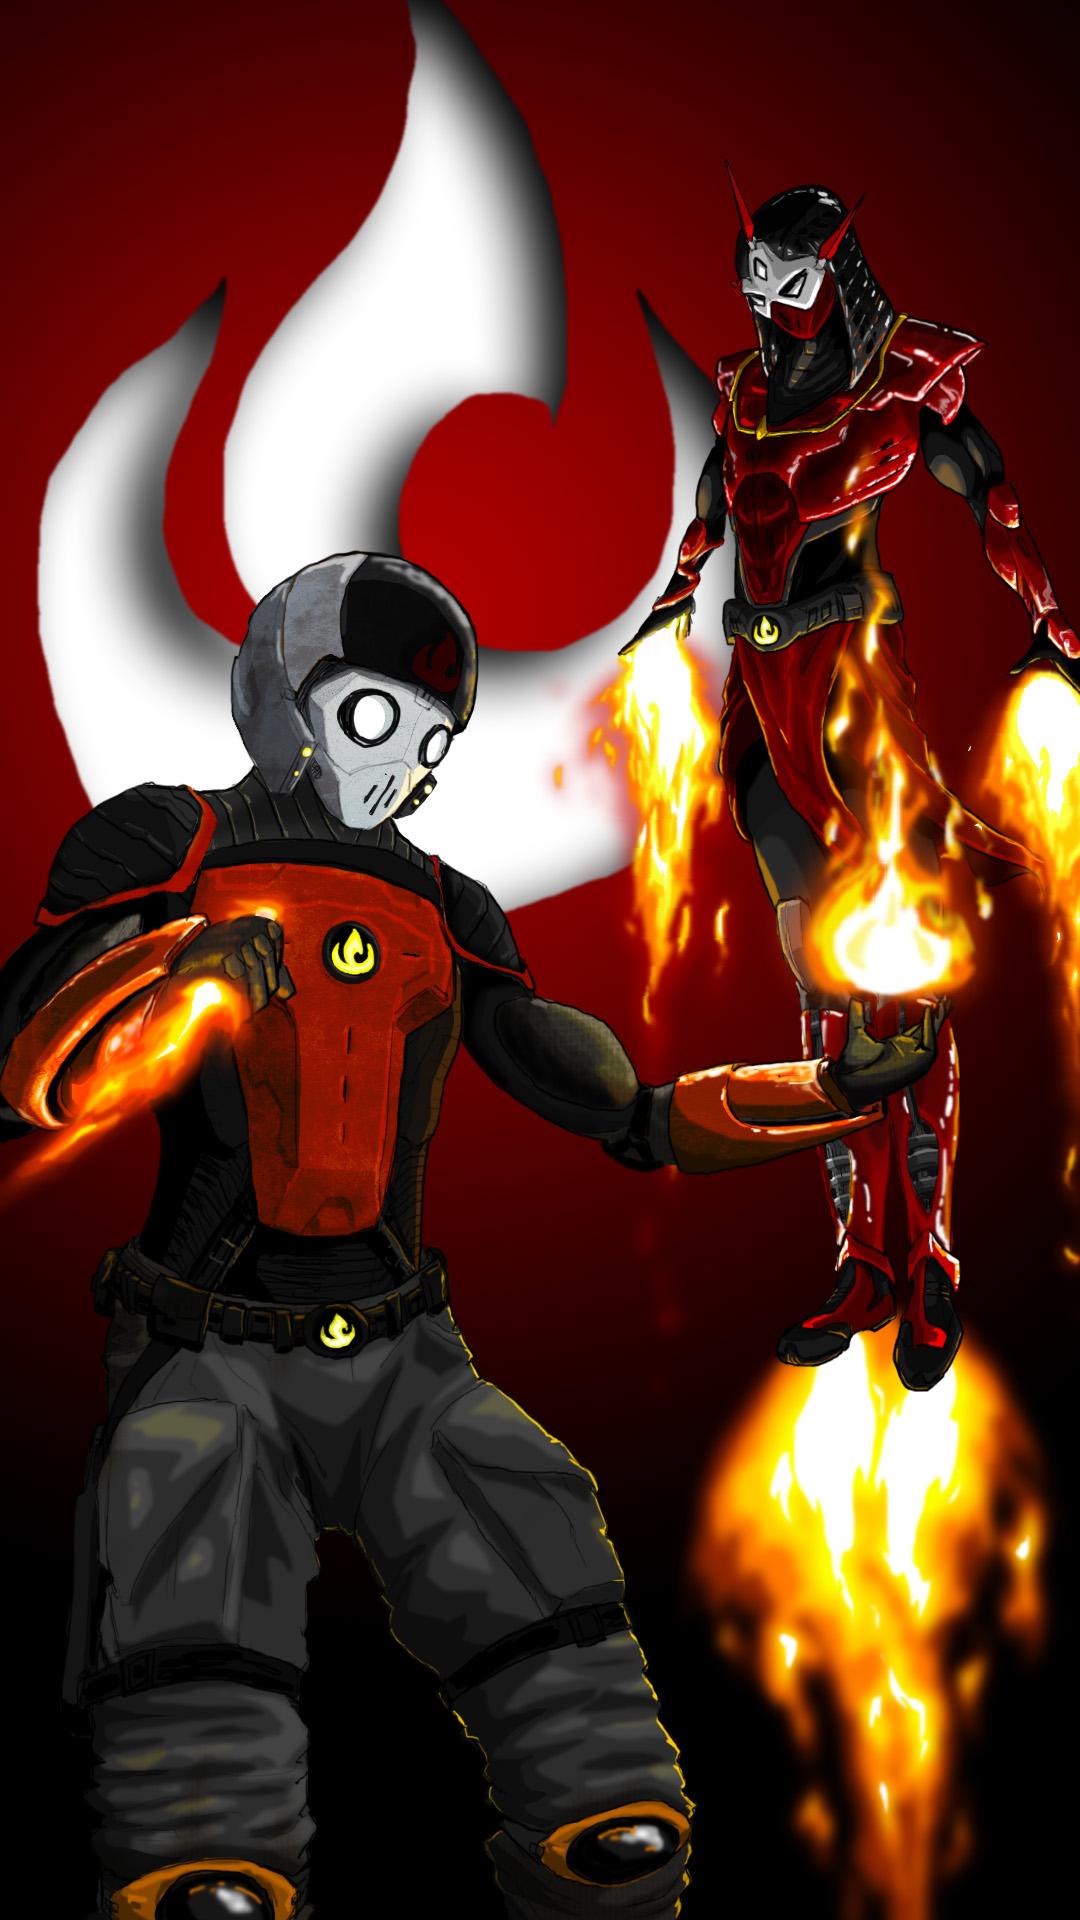 Future Avatar: Firebenders